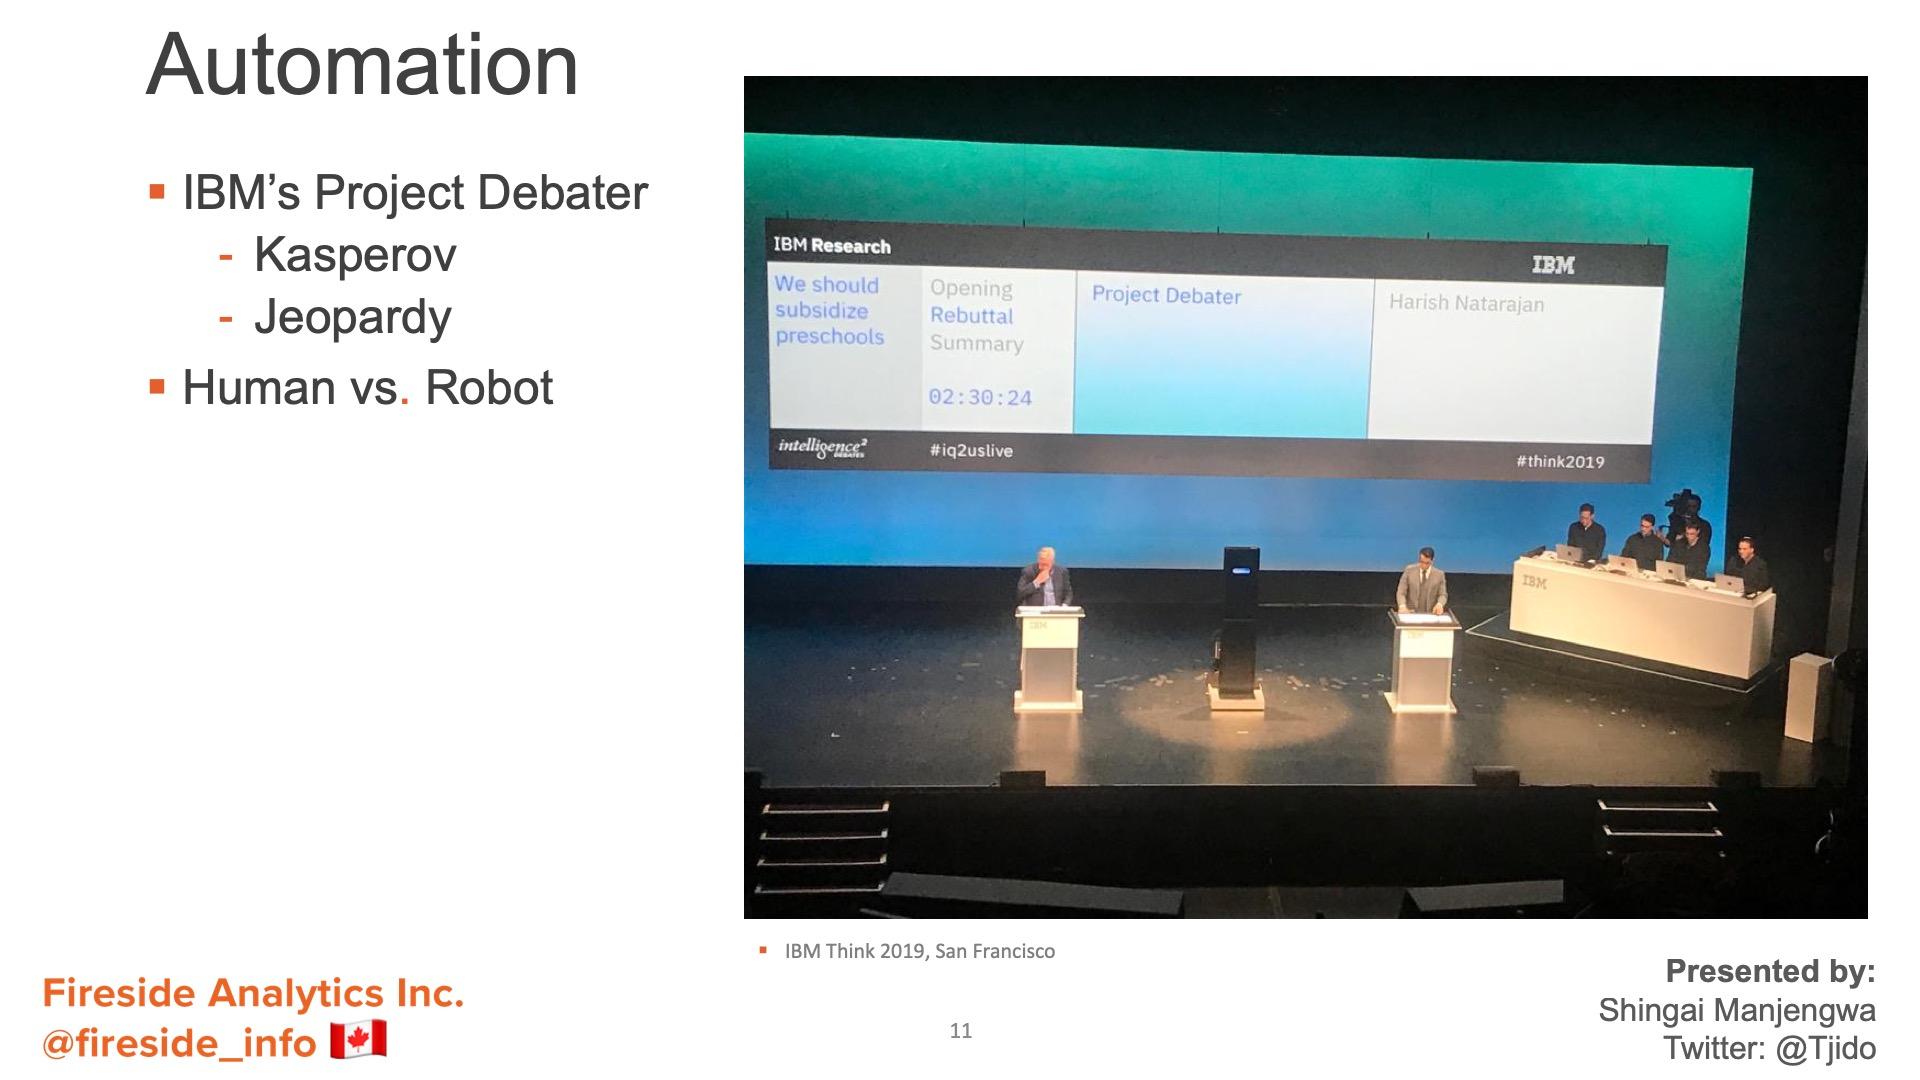 DAB Conference_Fireside Analytics Inc_11.jpeg